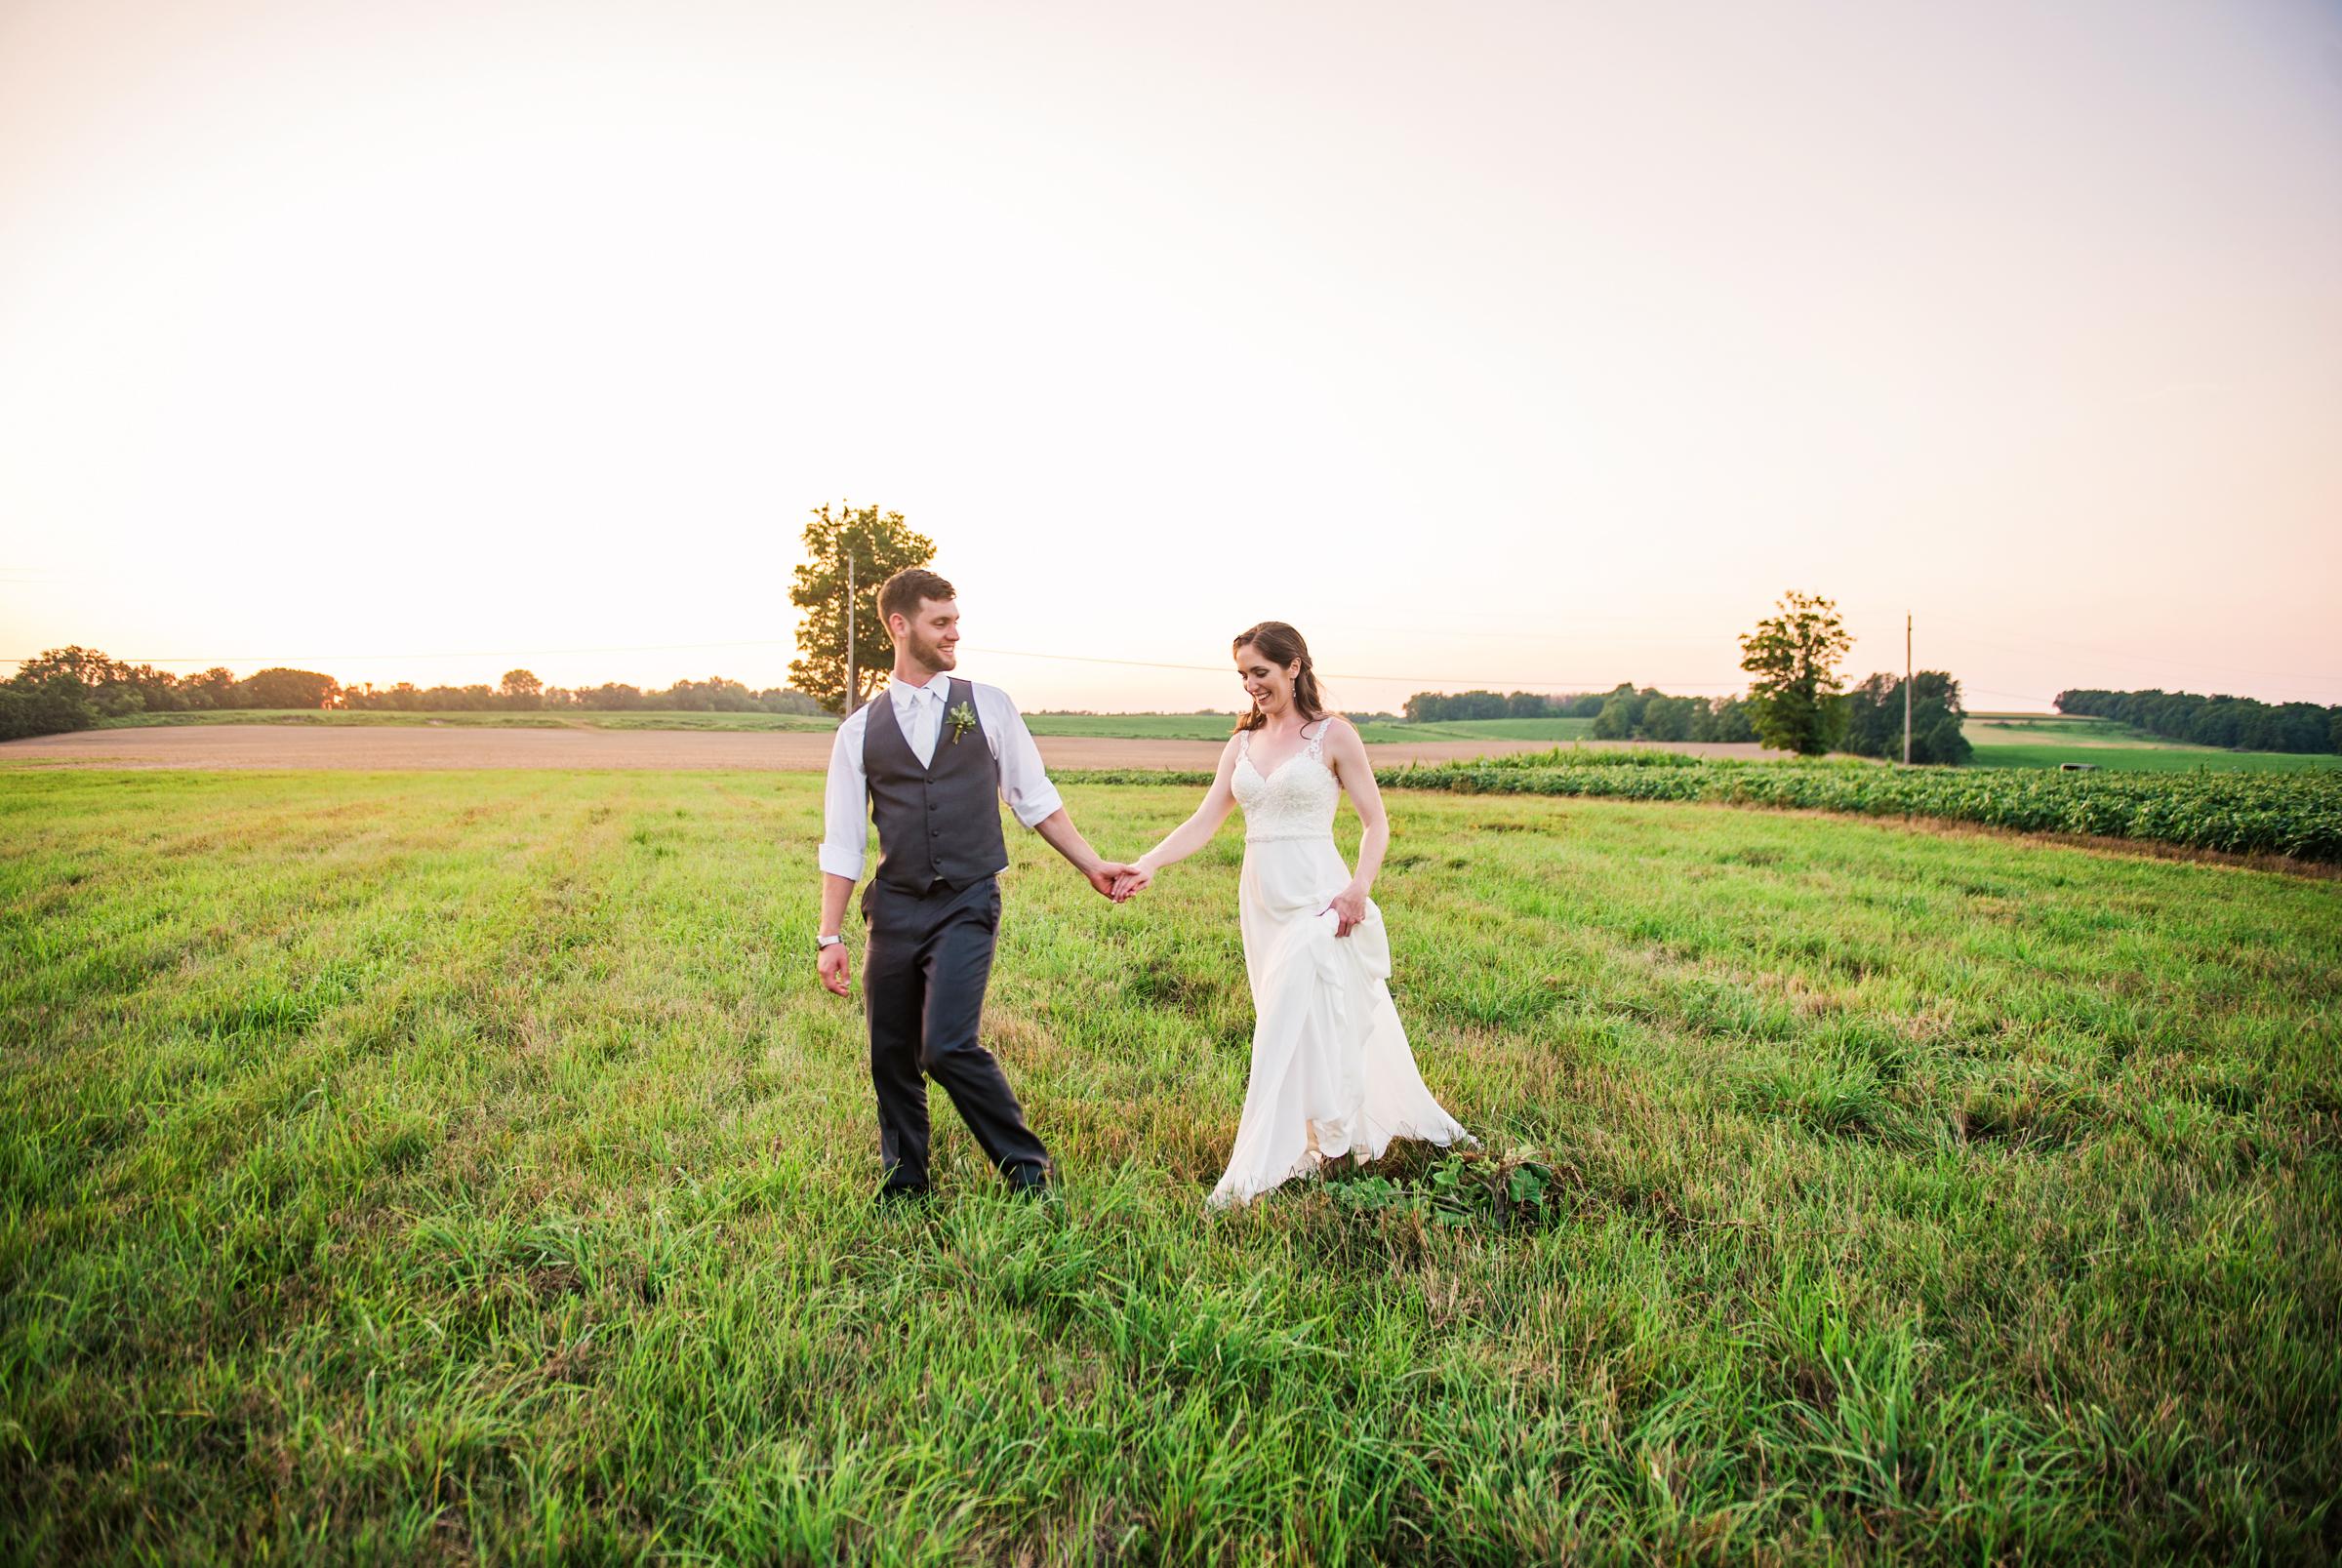 Jerris_Wadsworth_Wedding_Barn_Rochester_Wedding_JILL_STUDIO_Rochester_NY_Photographer_DSC_3124.jpg